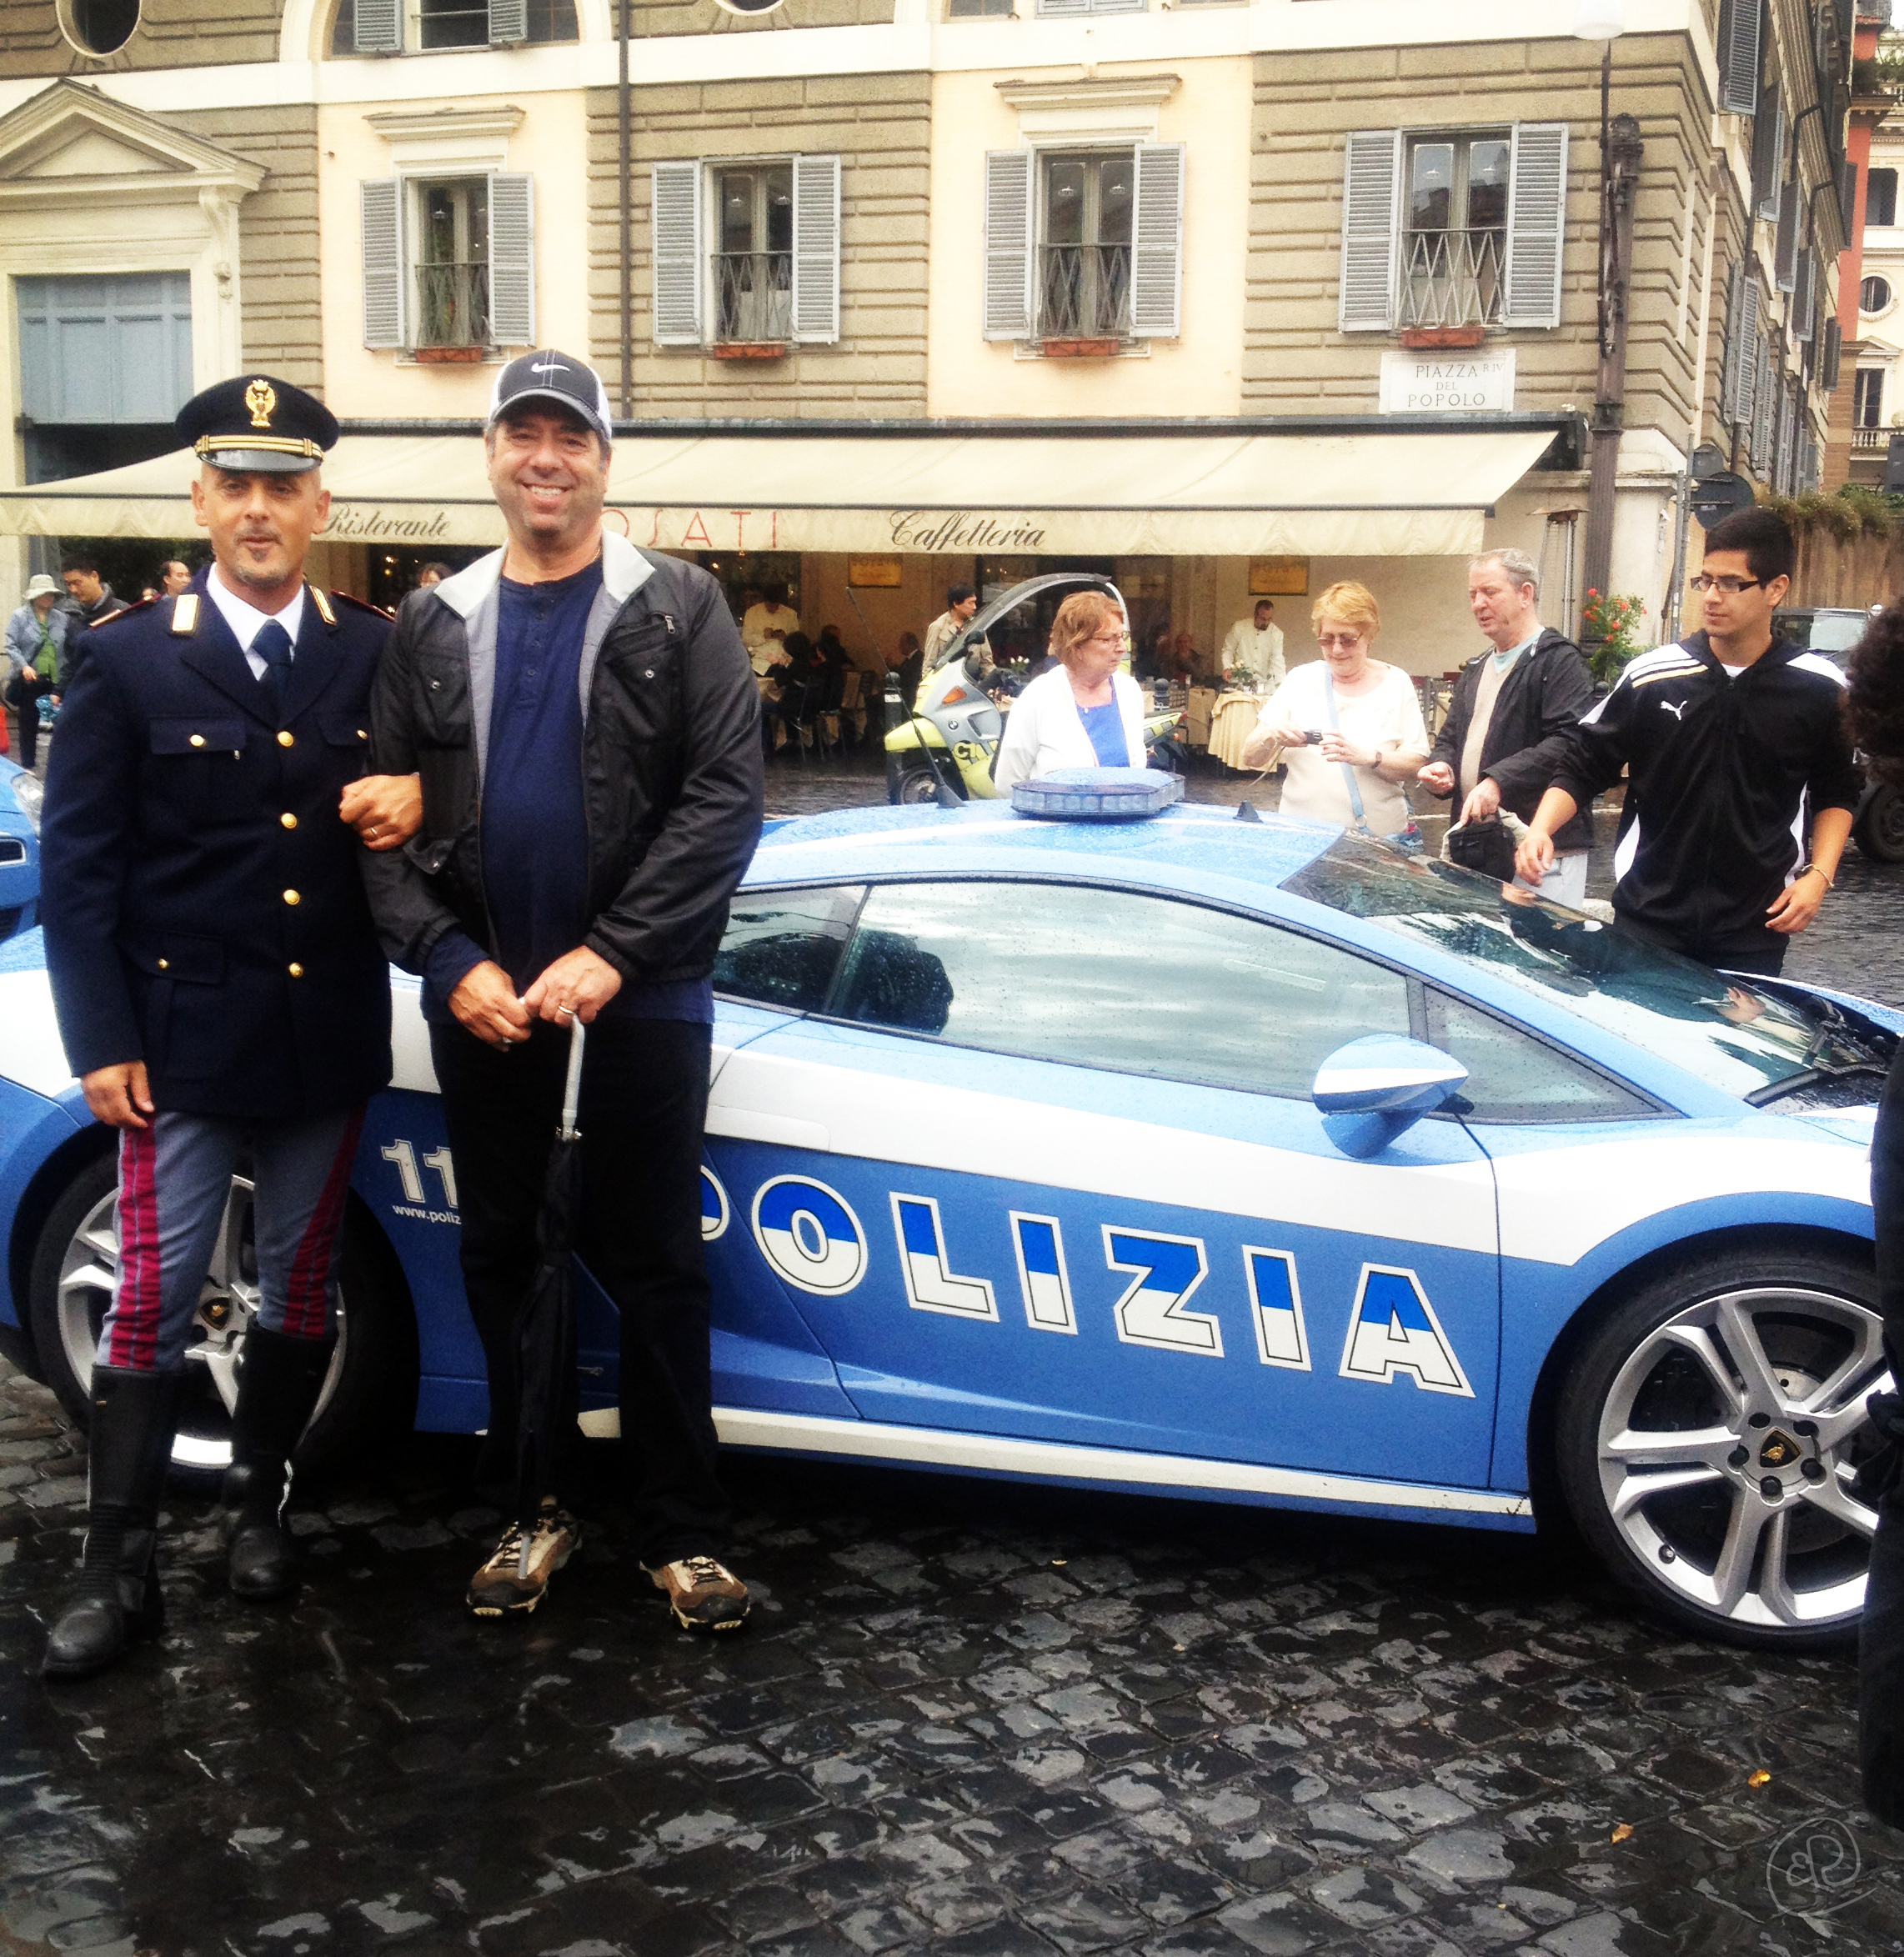 Police Car WM.jpg